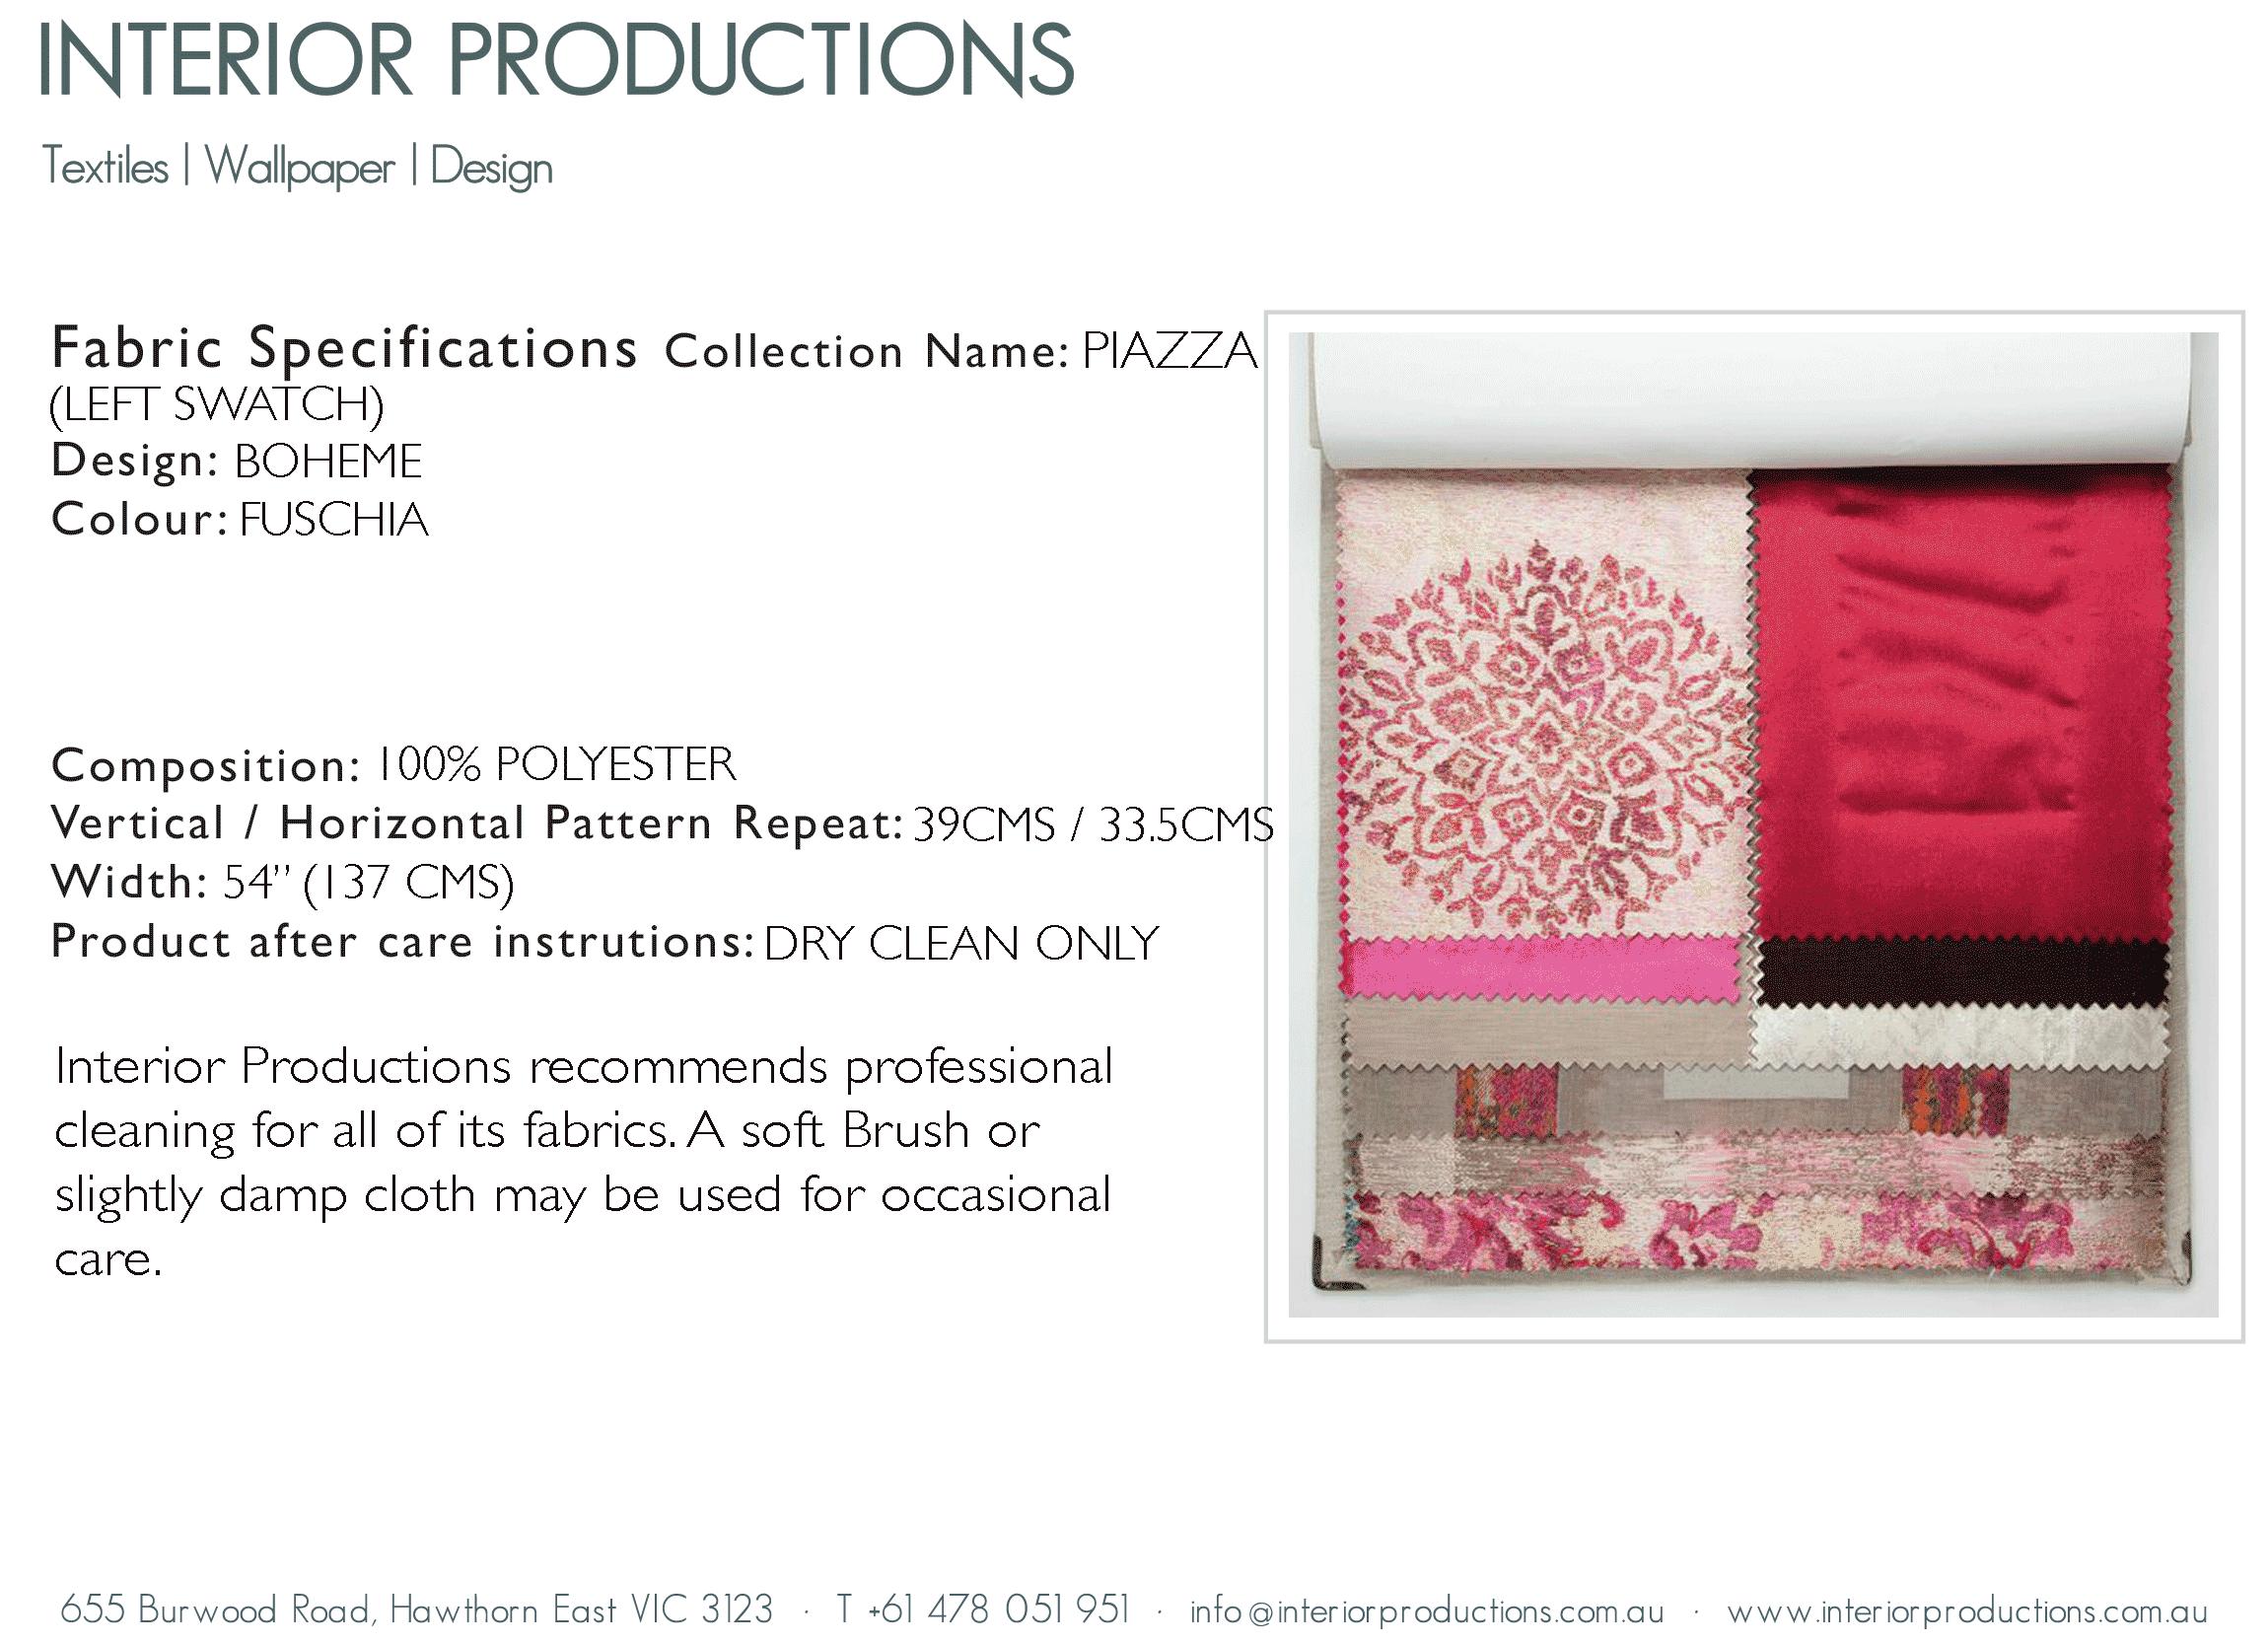 interior_productions_BOHEME---FUSCHIA